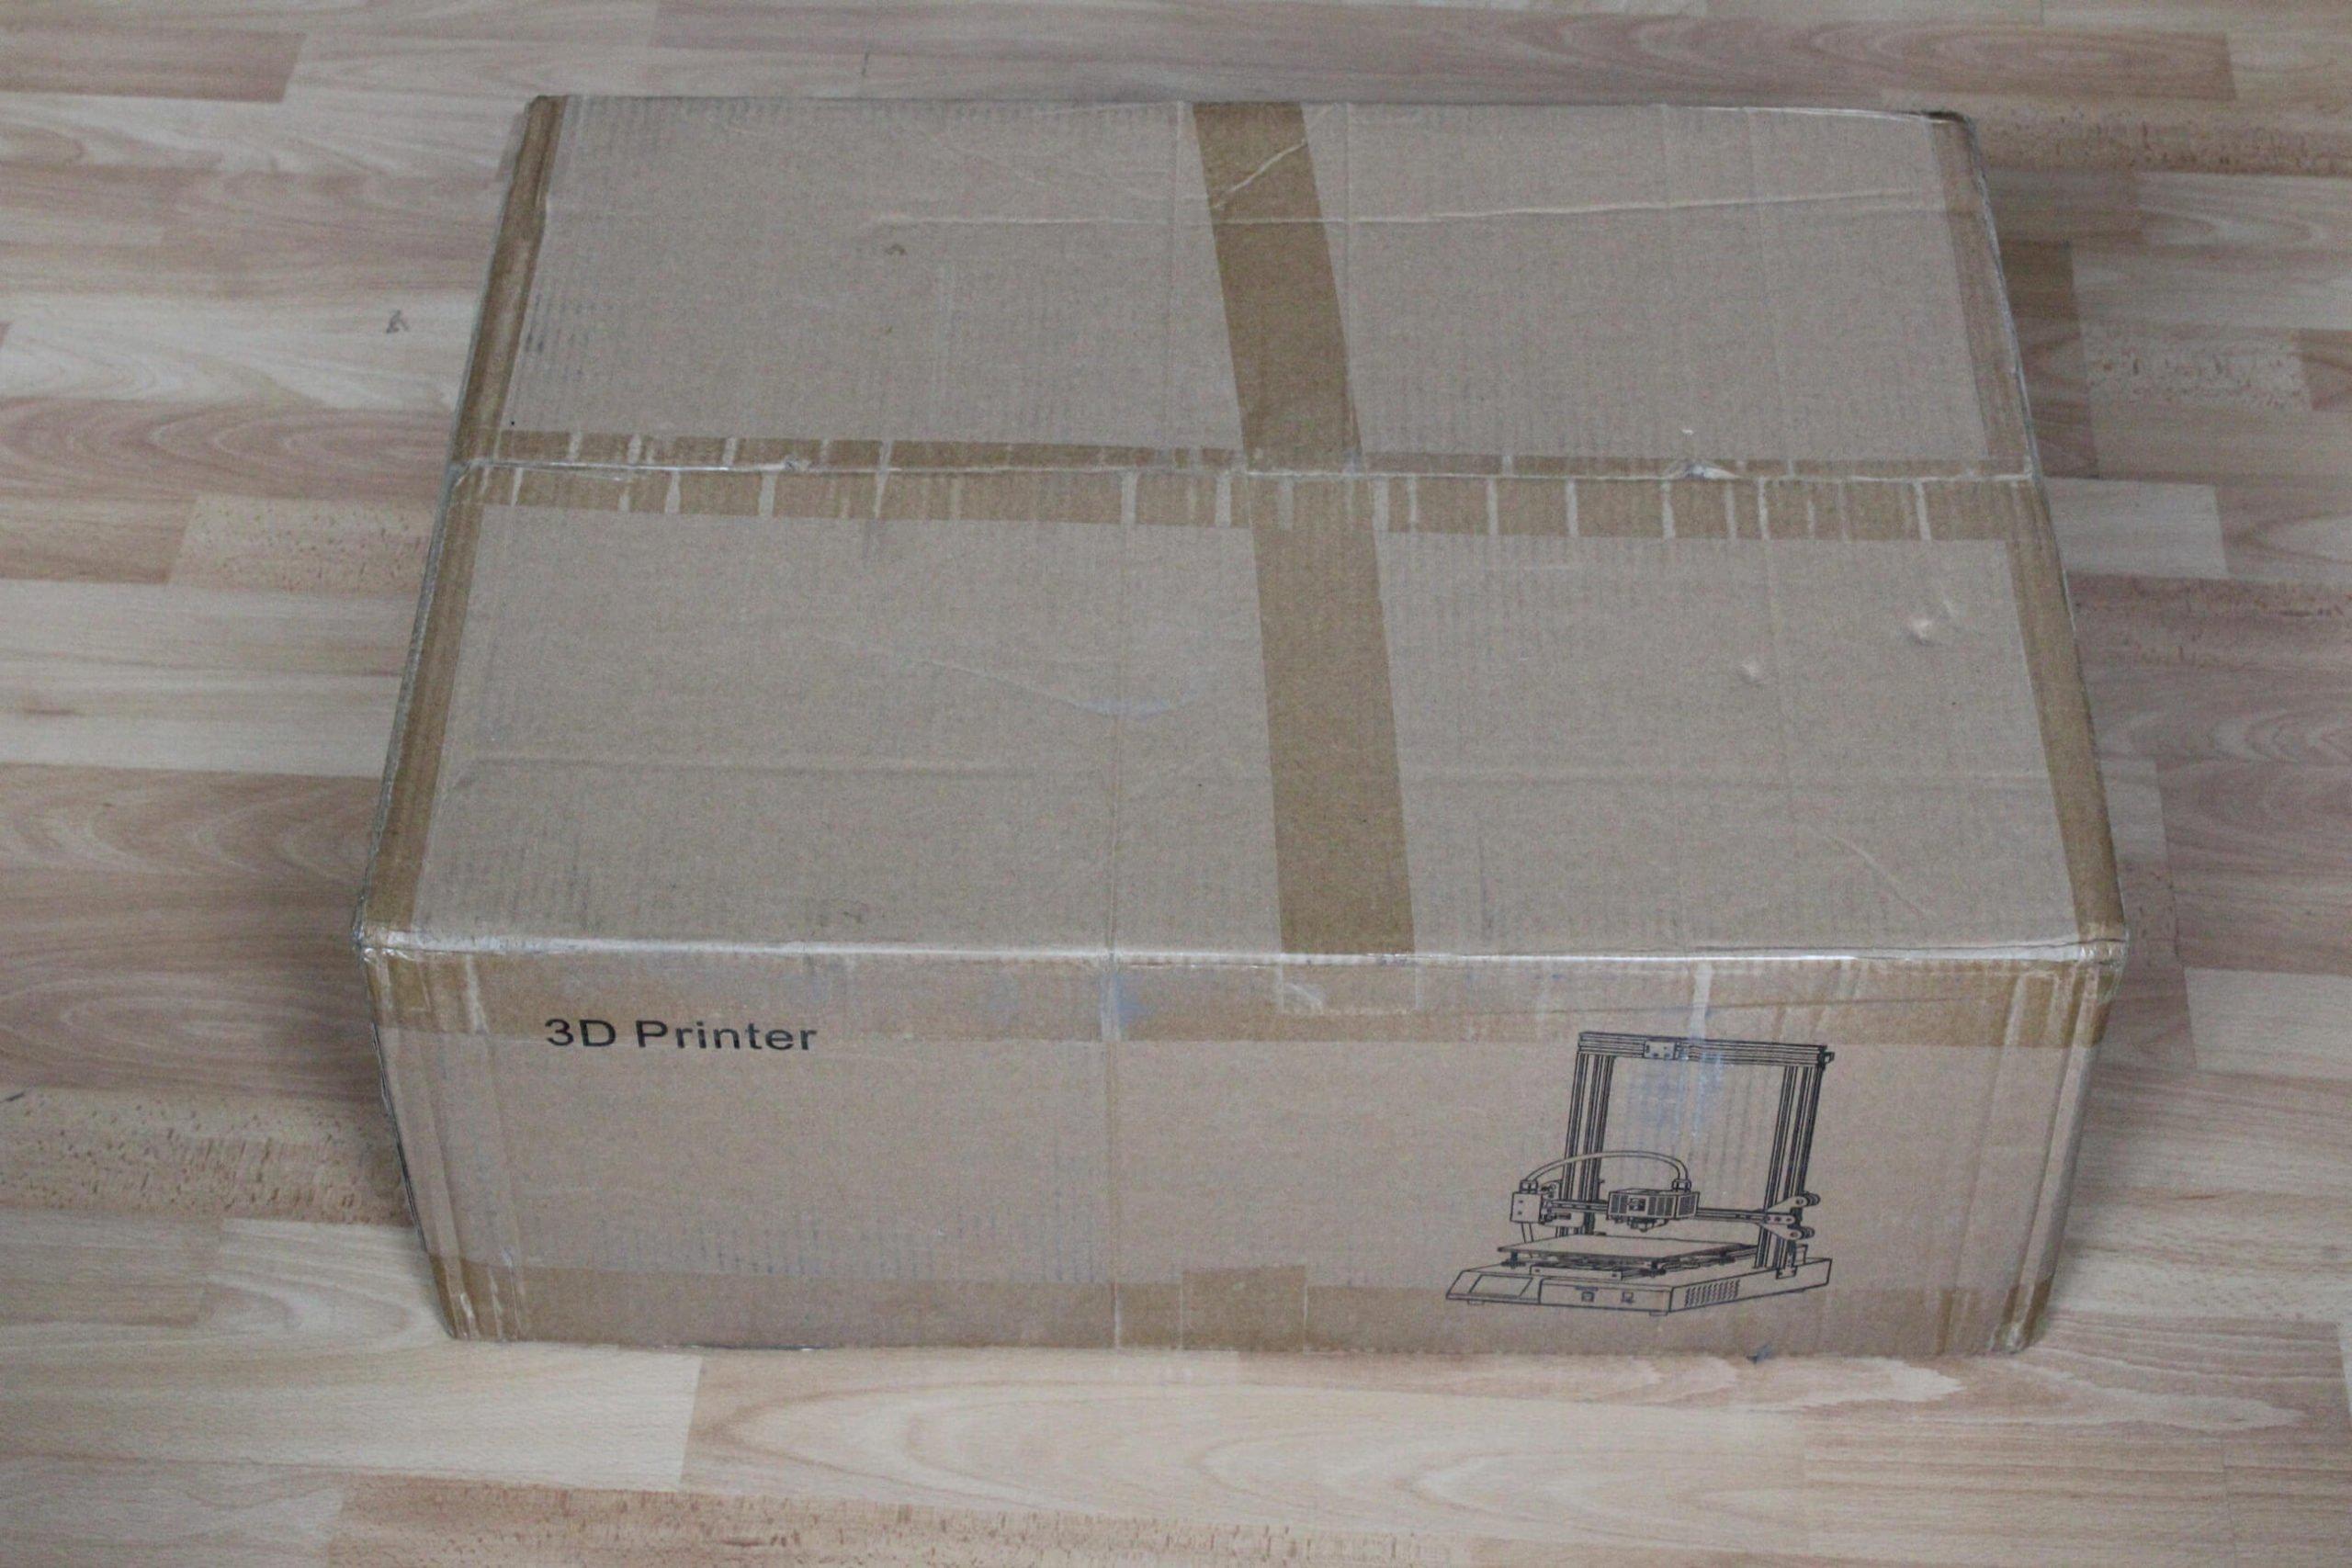 Mingda-D3-Pro-Review-Packaging-5